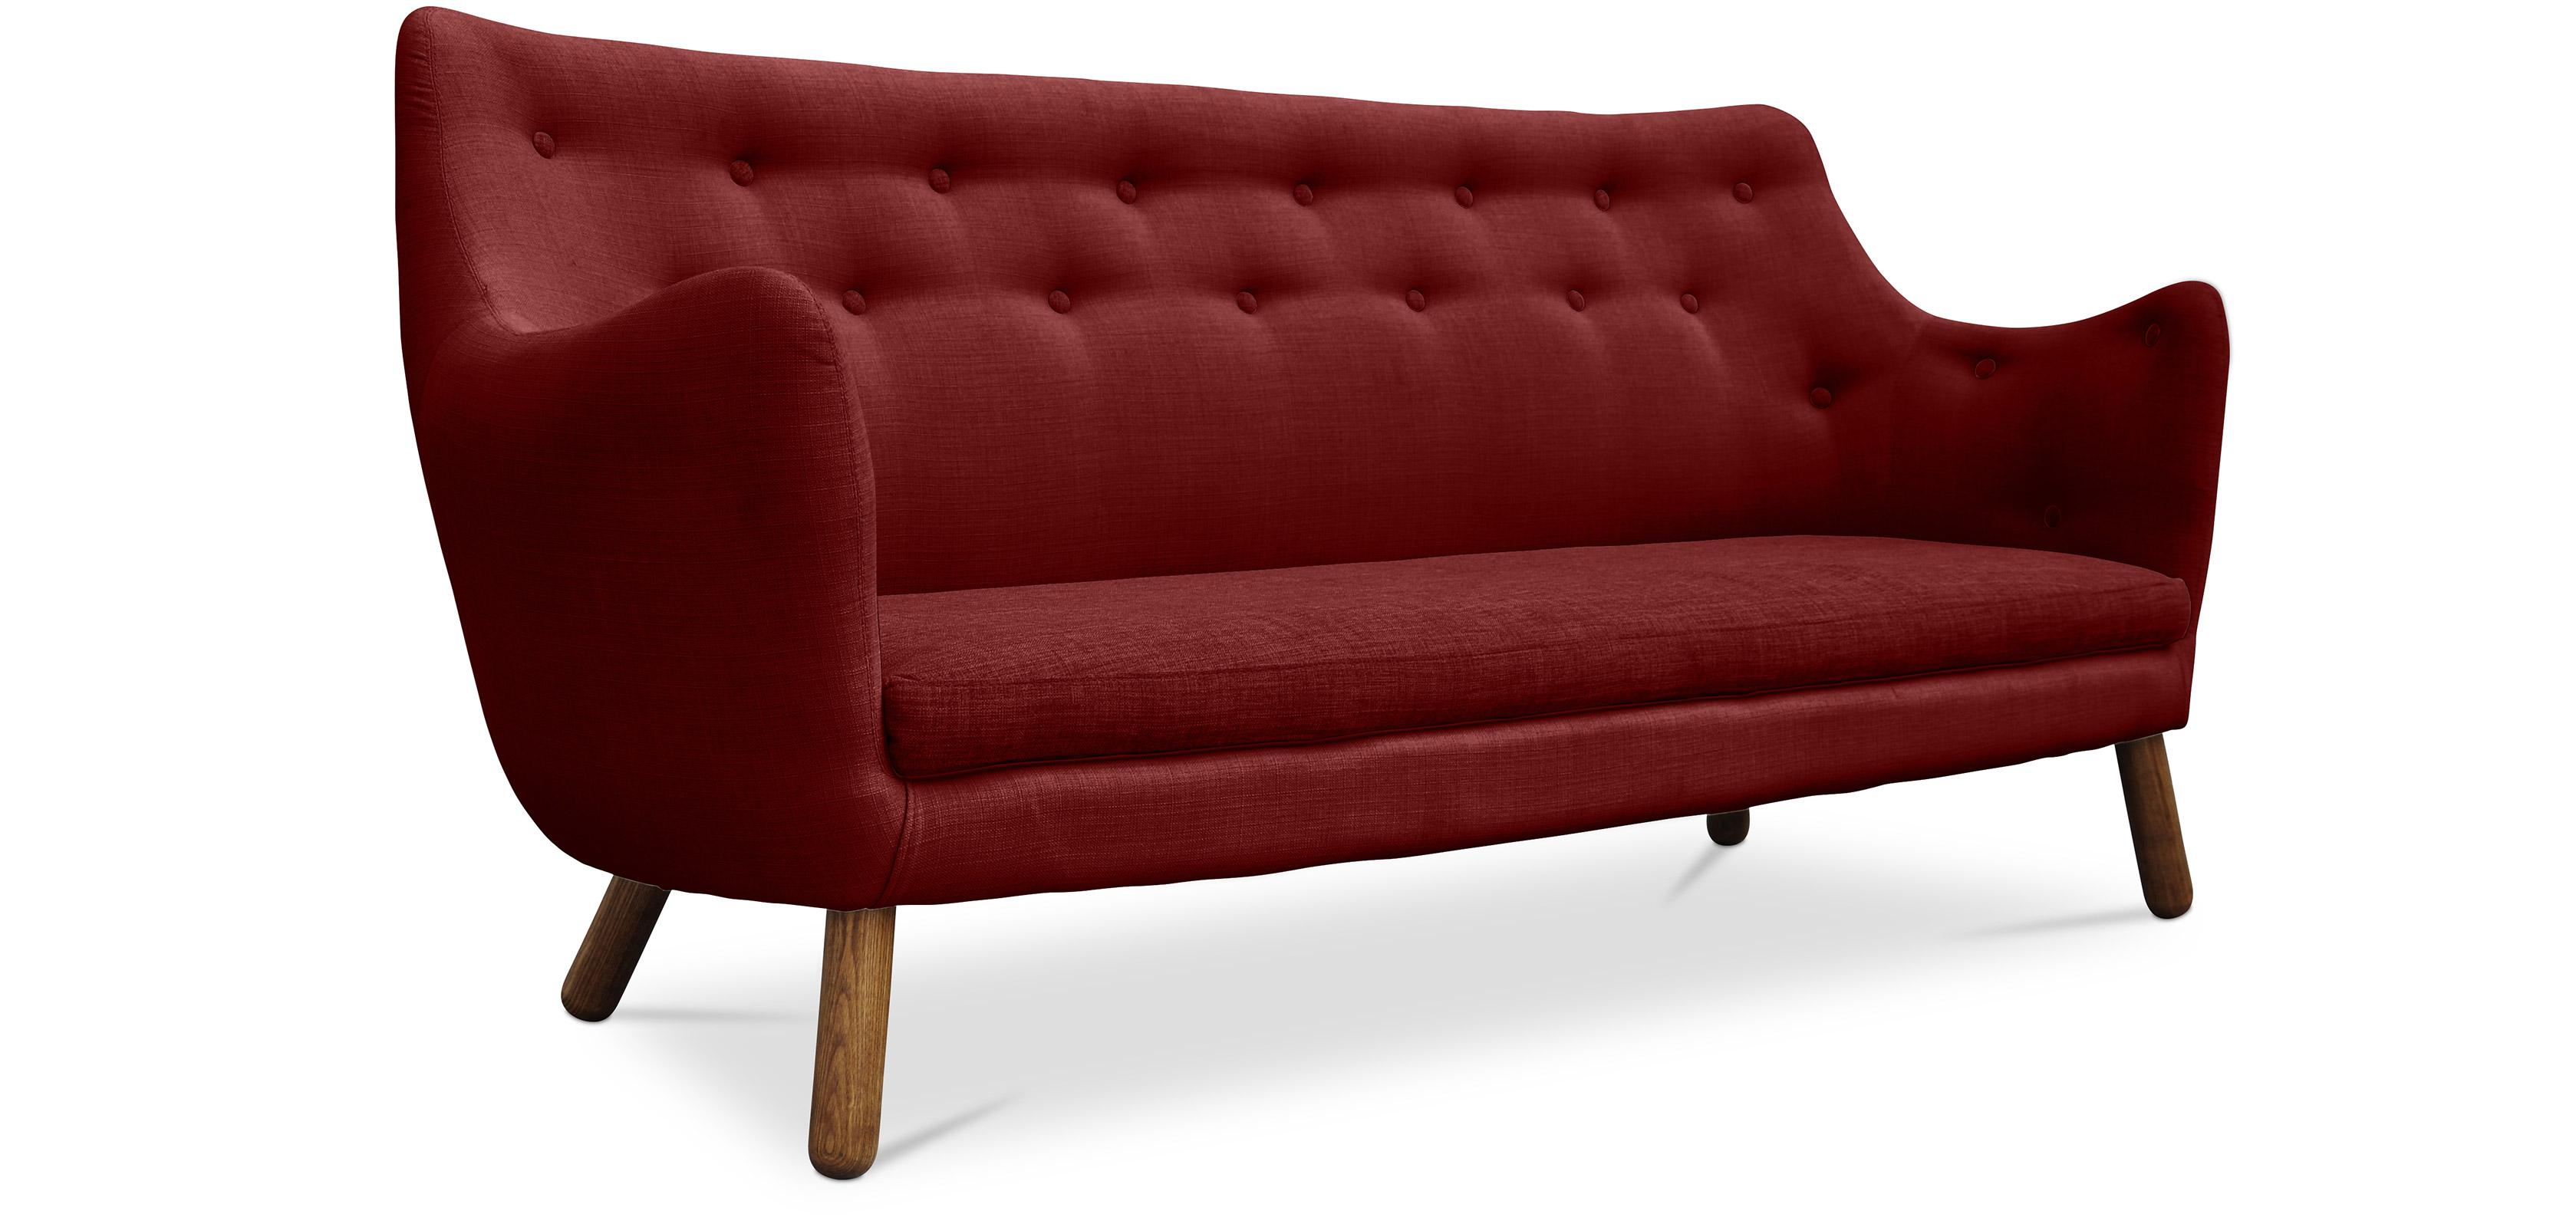 finn juhl poet sofa sale queen sleeper 3 seater fabric